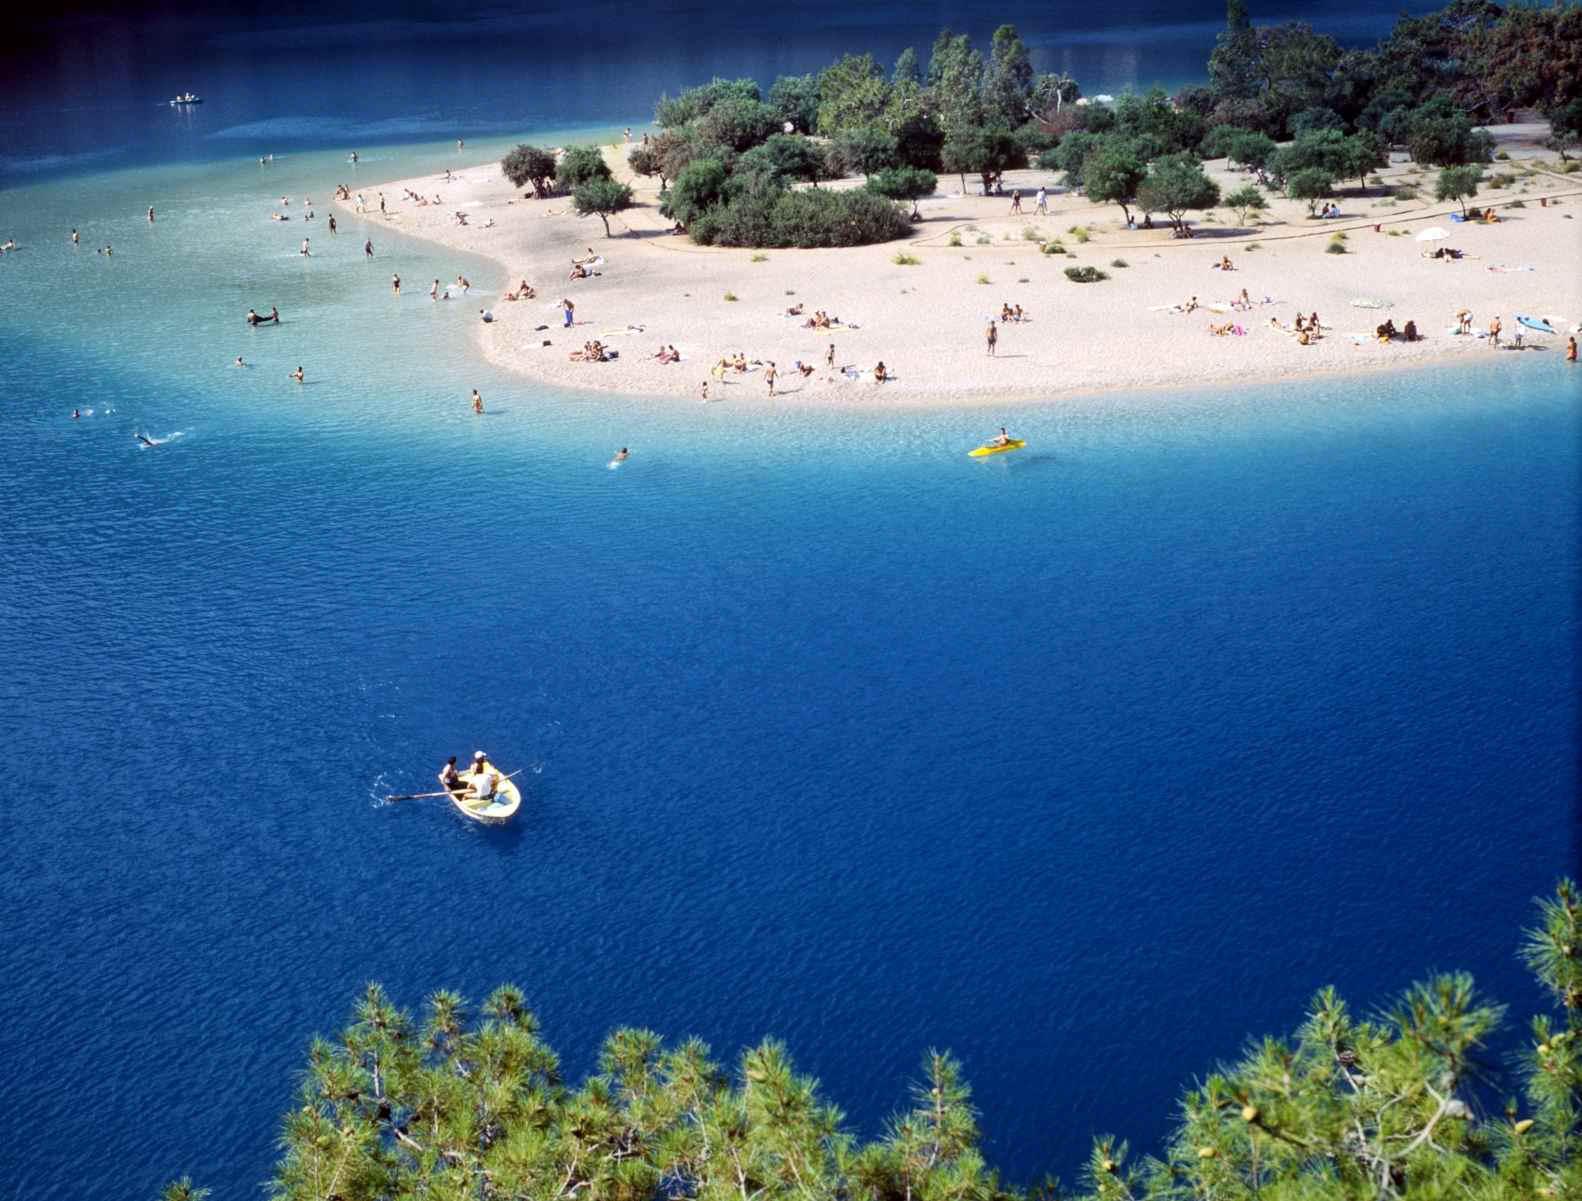 Oludeniz in Turkey